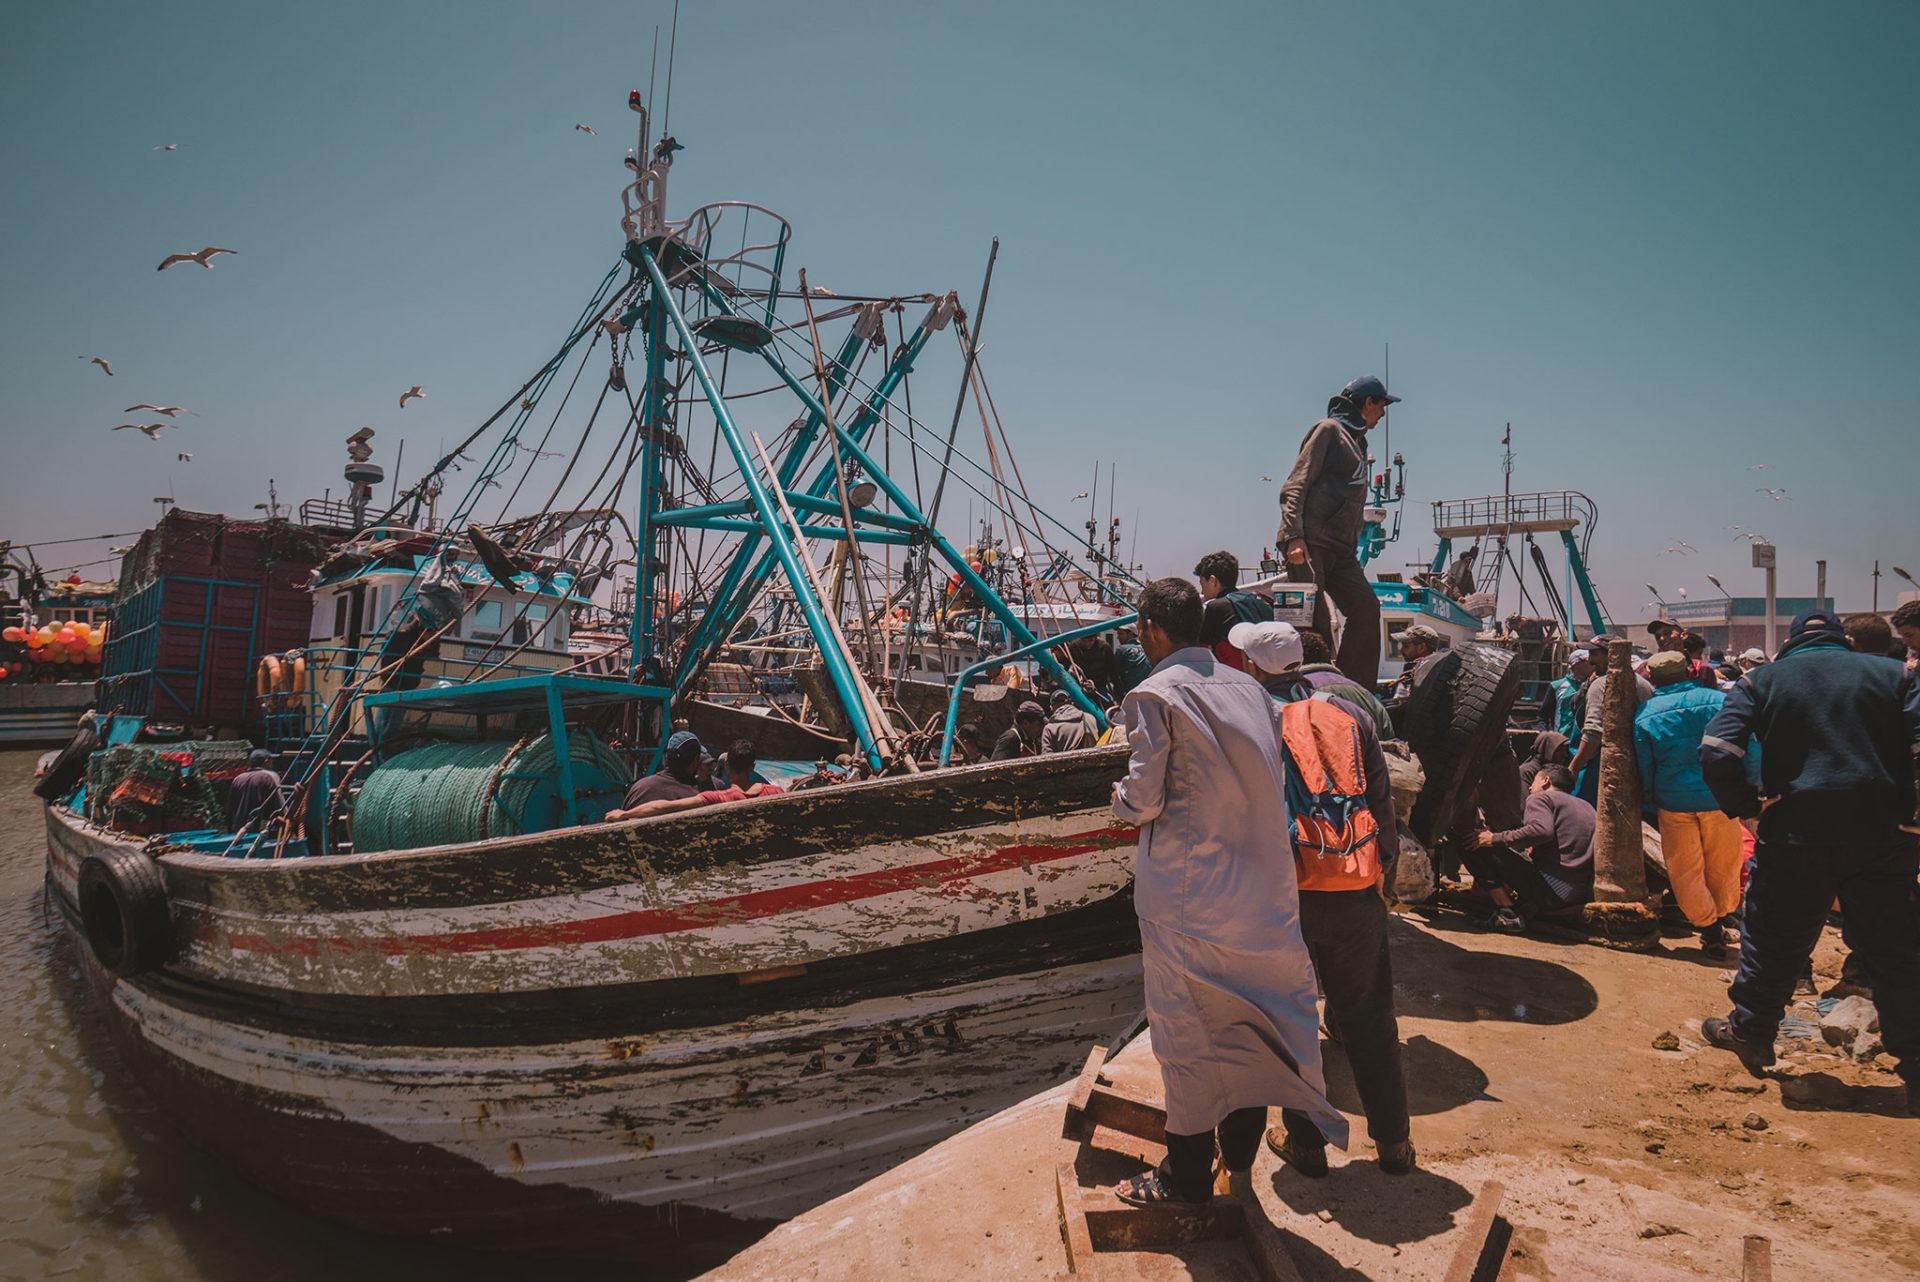 Visiter Essaouira (Mogador) et son port de pêche